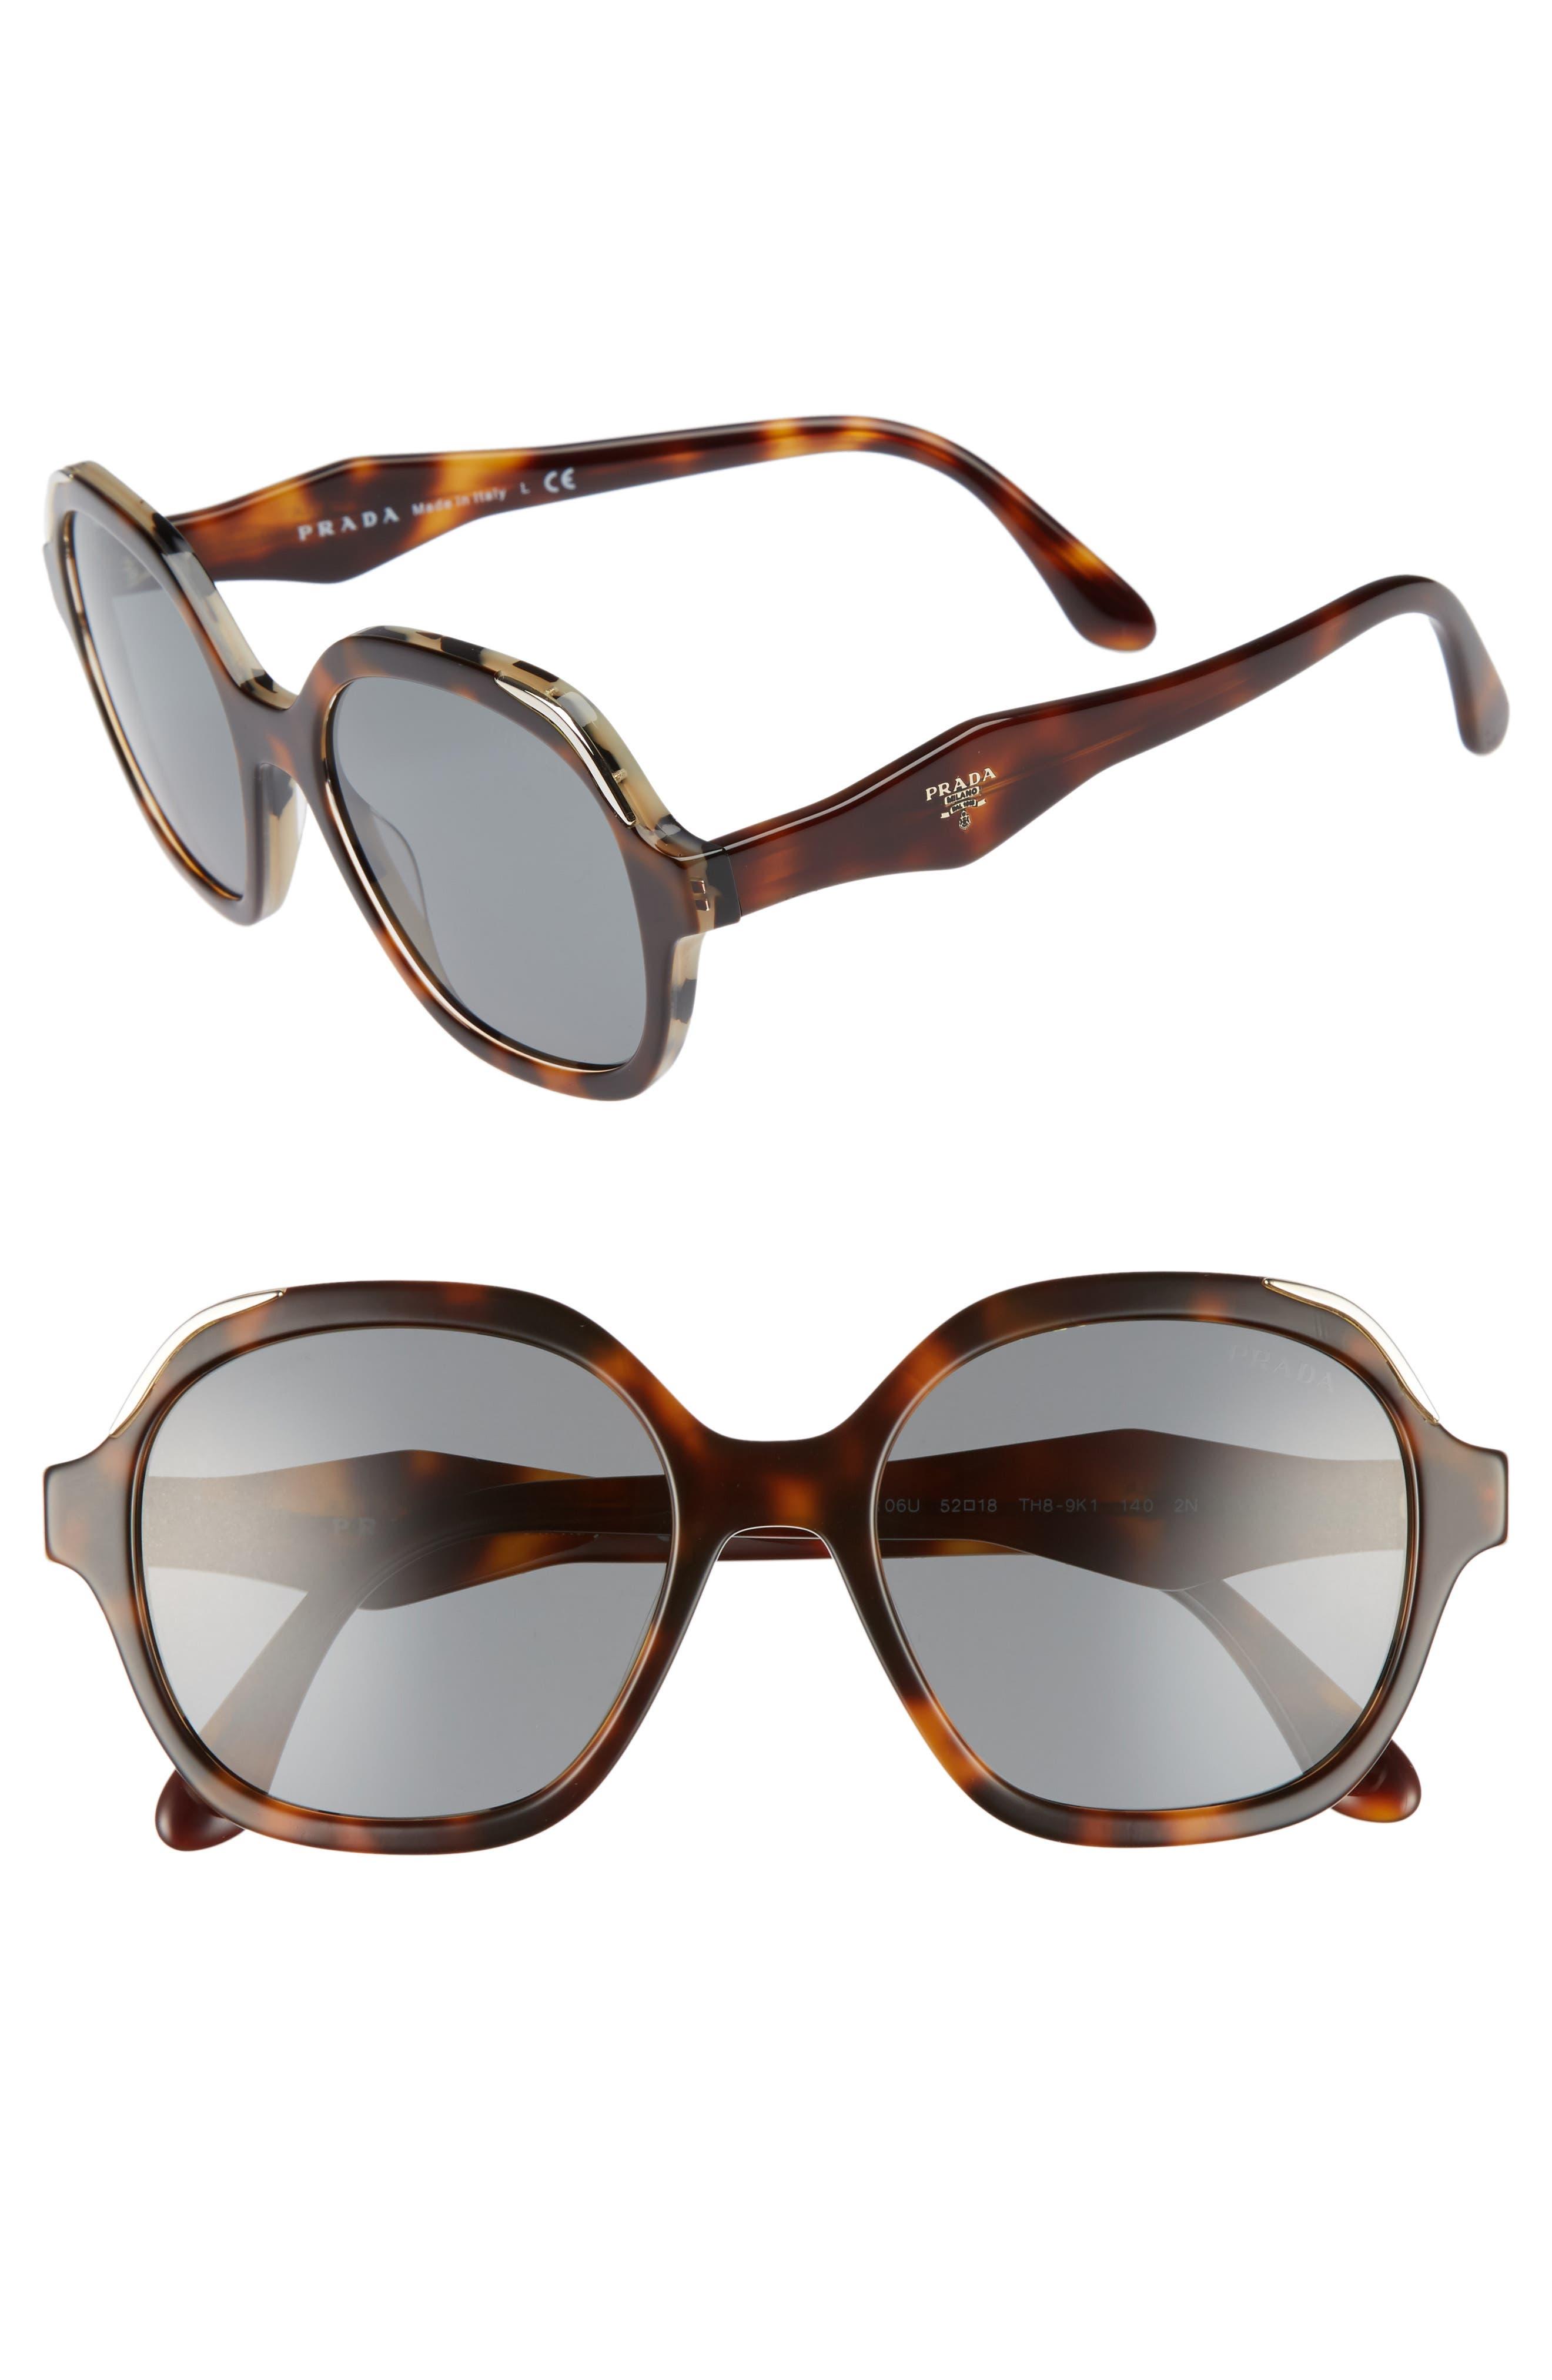 50mm Square Sunglasses,                             Main thumbnail 1, color,